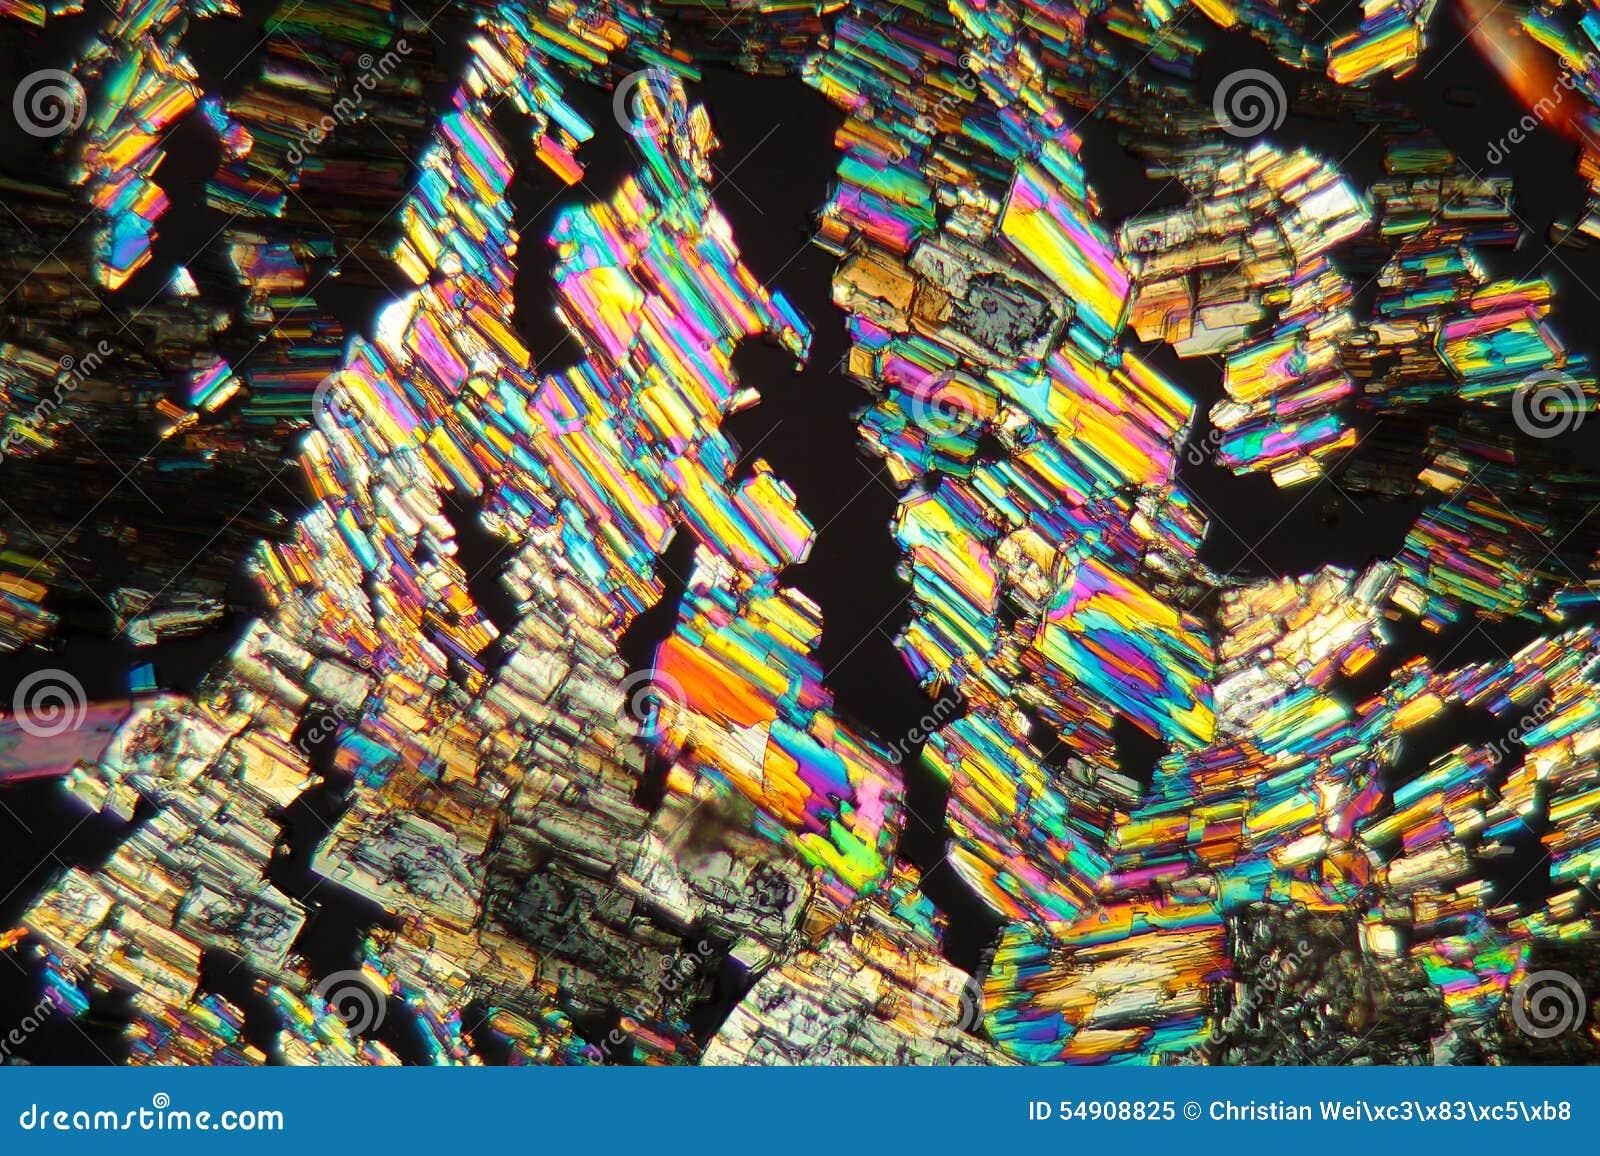 Alanin aminosäure unter dem mikroskop stockbild bild von